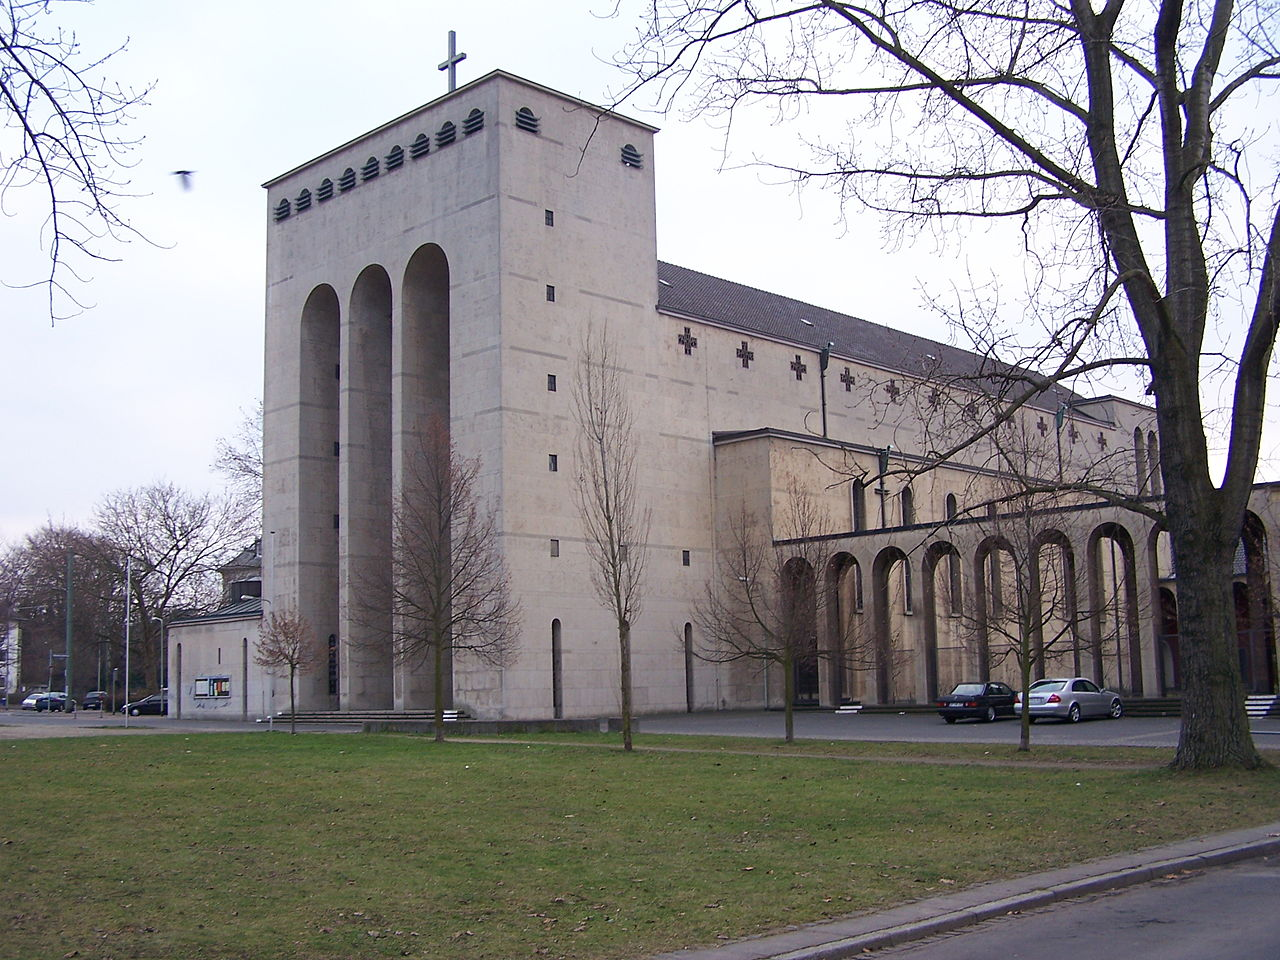 Bild Frauenfriedenskirche Frankfurt Bockenheim